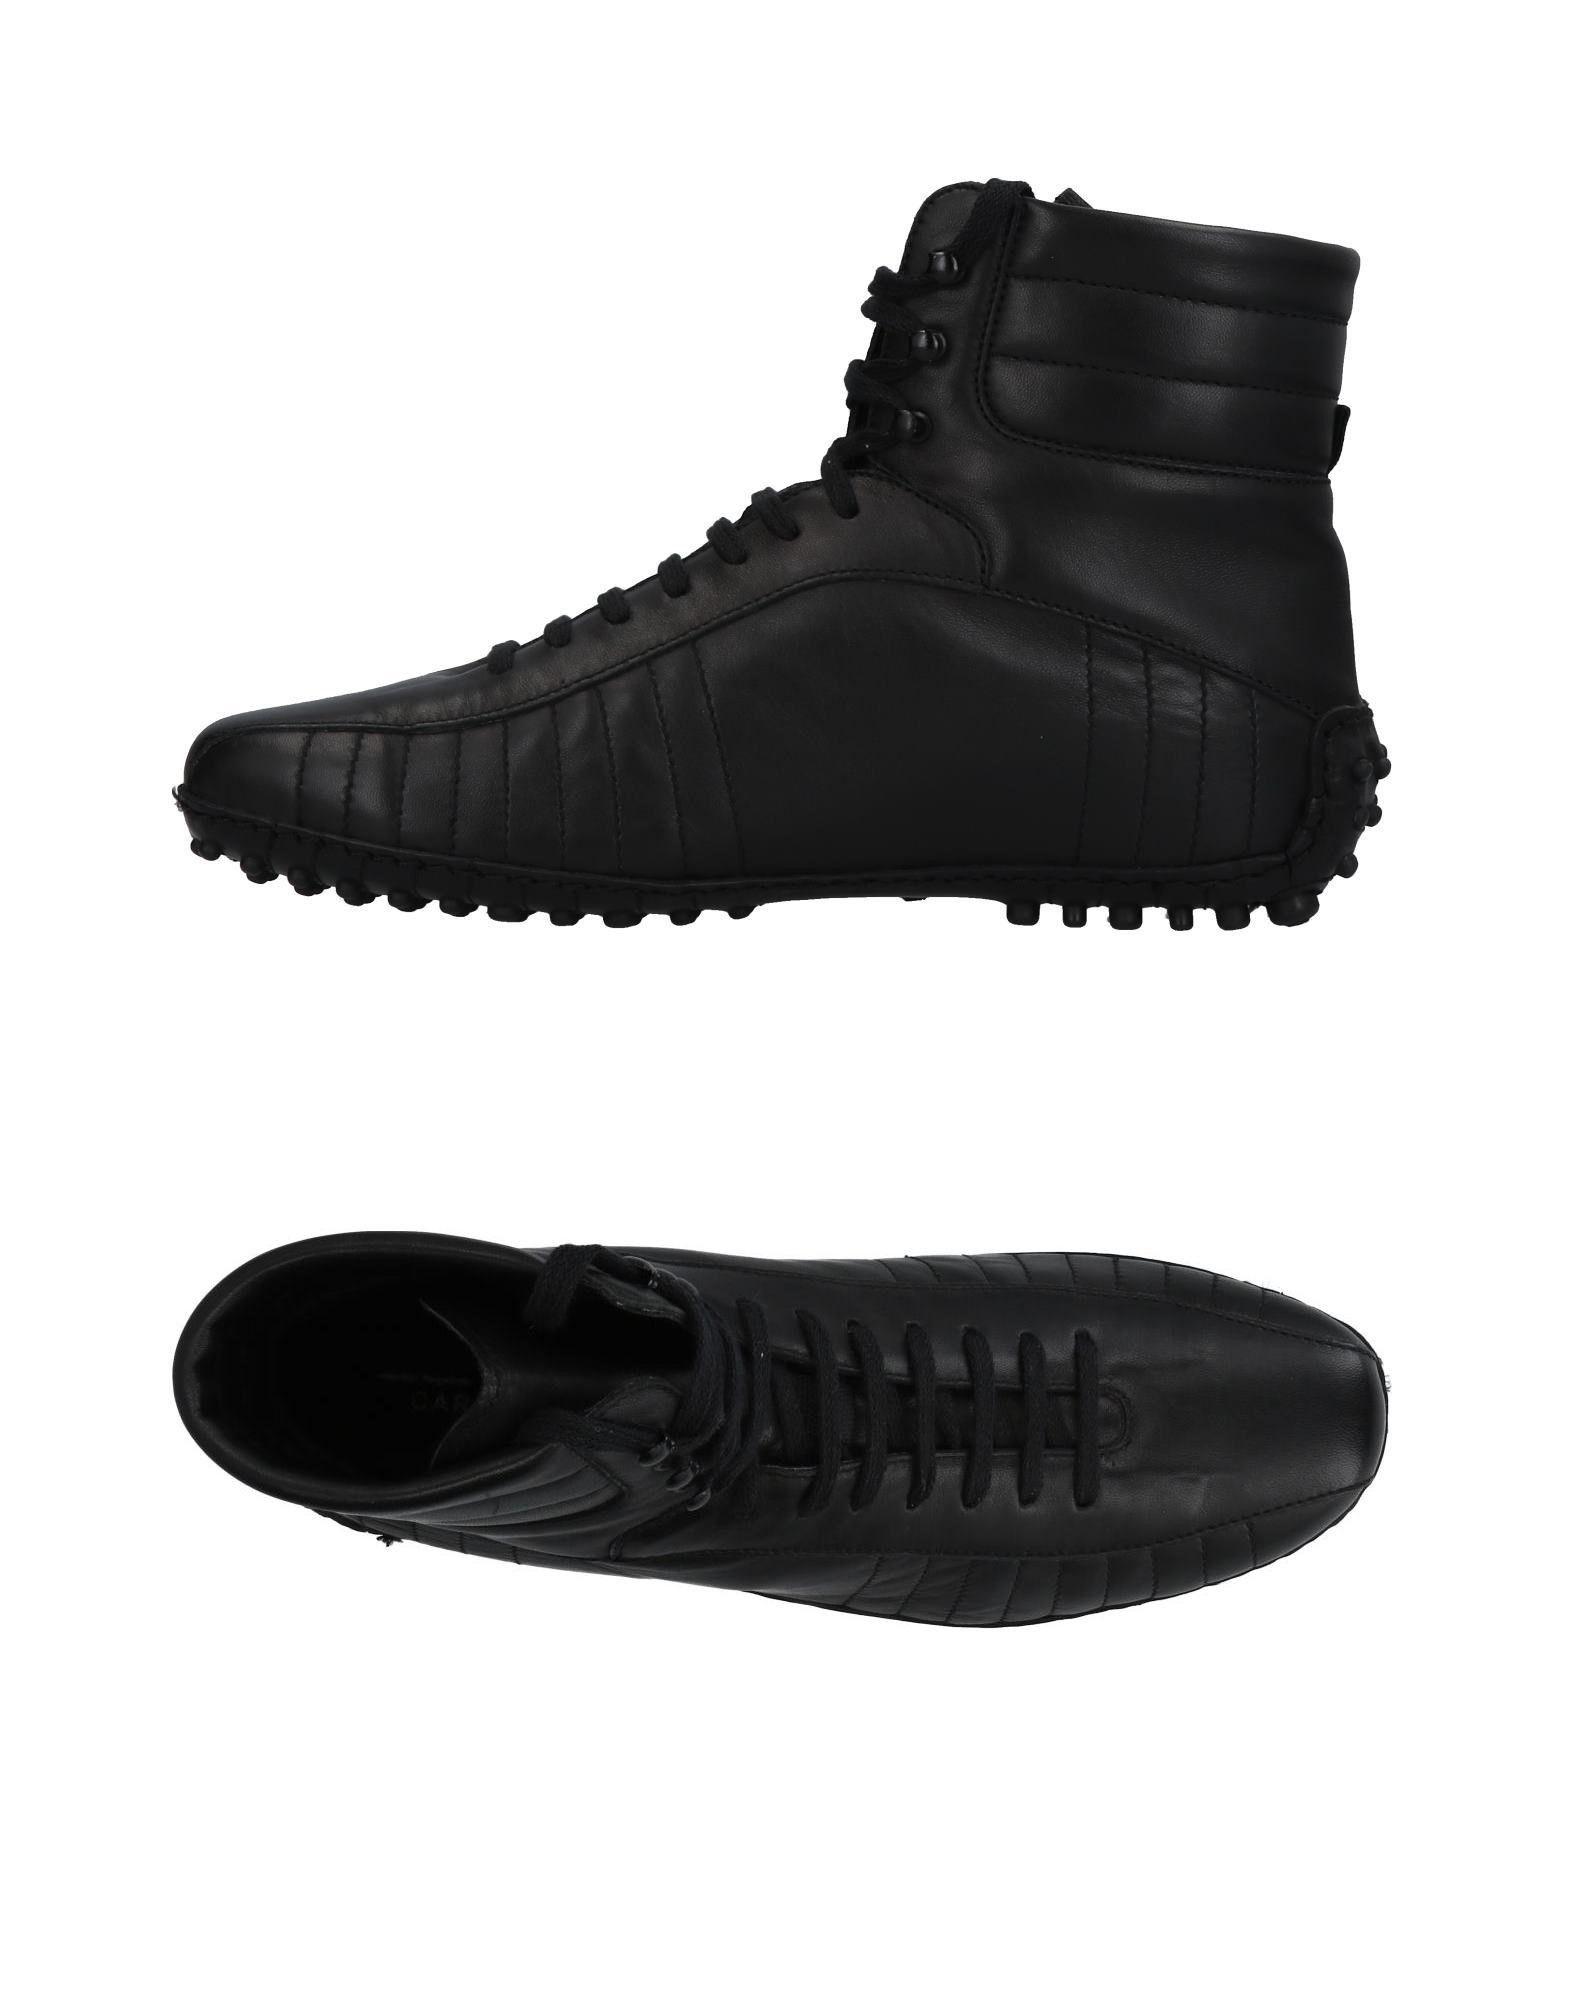 CARSHOE Высокие кеды и кроссовки кеды кроссовки высокие dc council mid tx stone camo